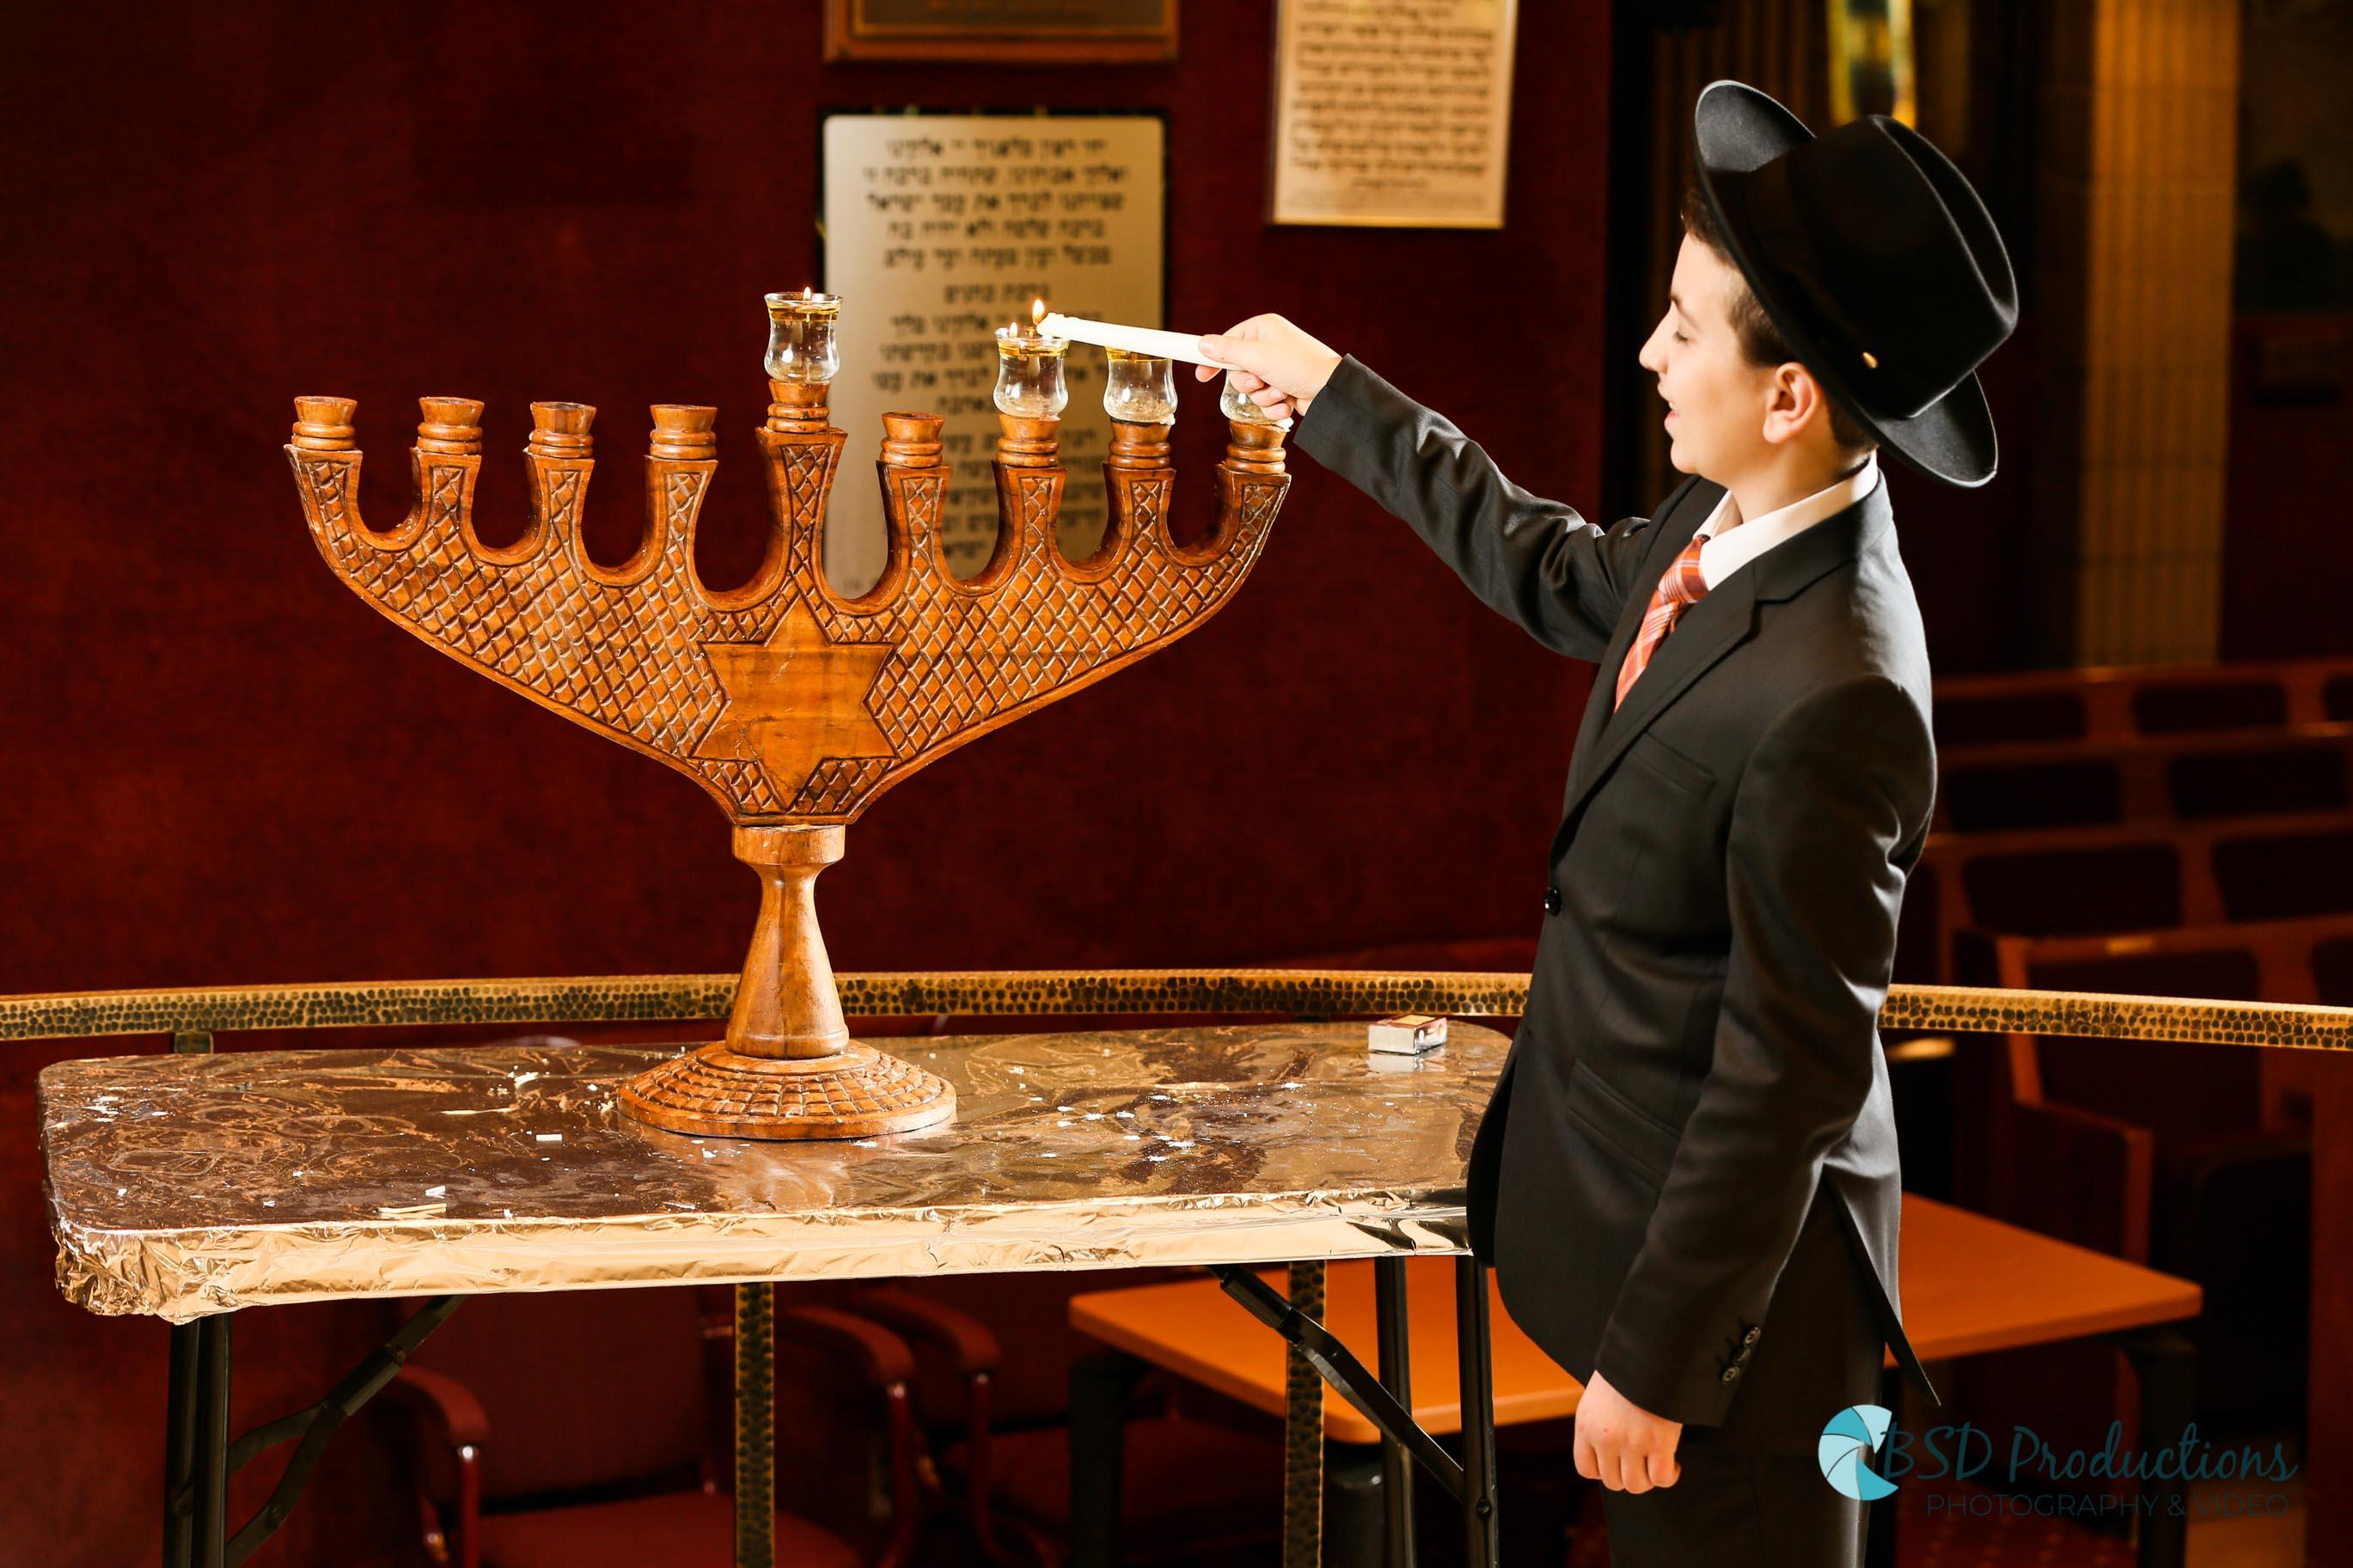 UH5A5174 Bar Mitzvah – BSD Prodcutions Photography